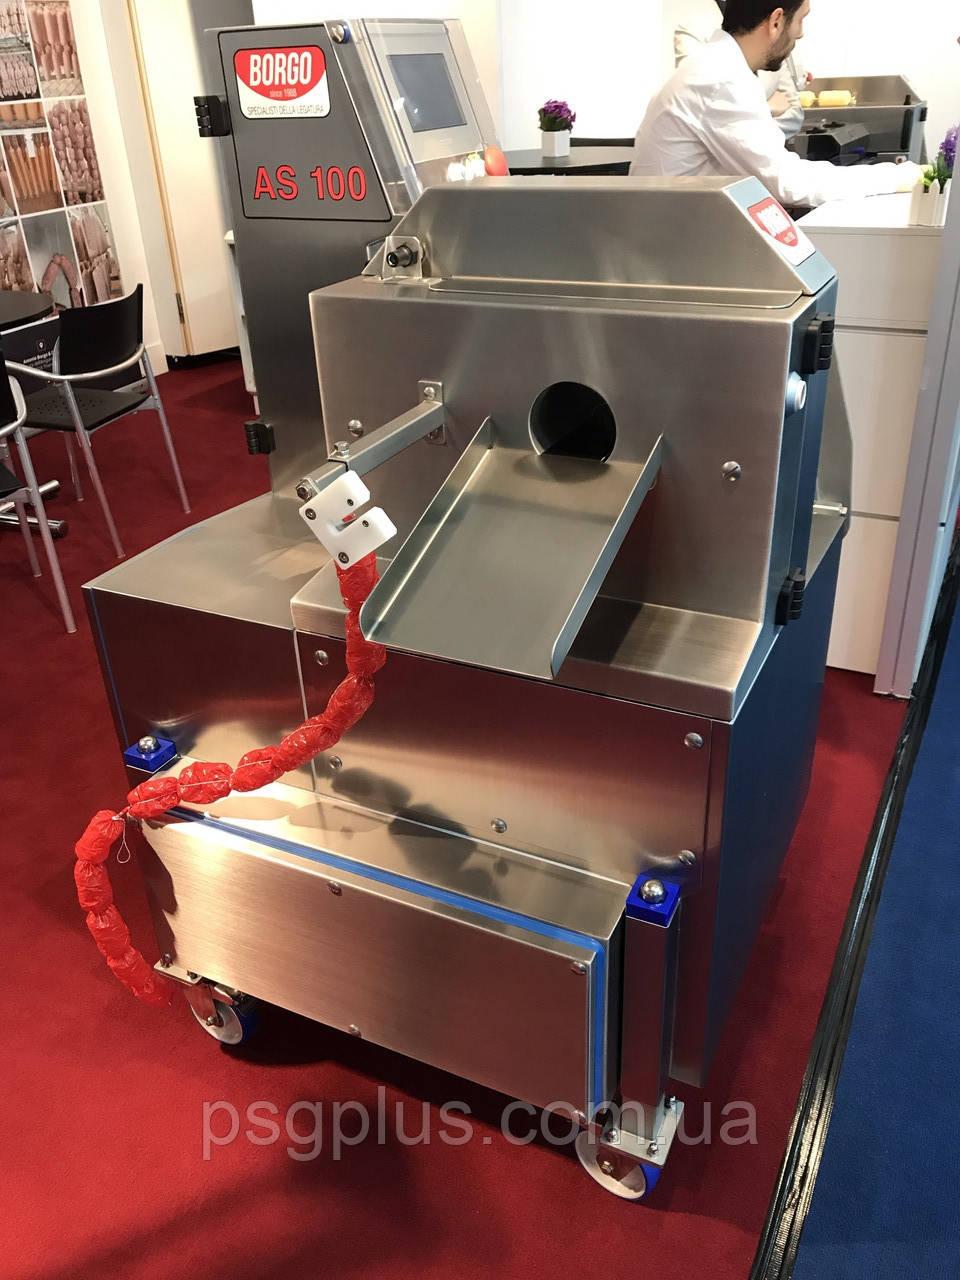 Машина для вязки колбас AS 100 E Borgo